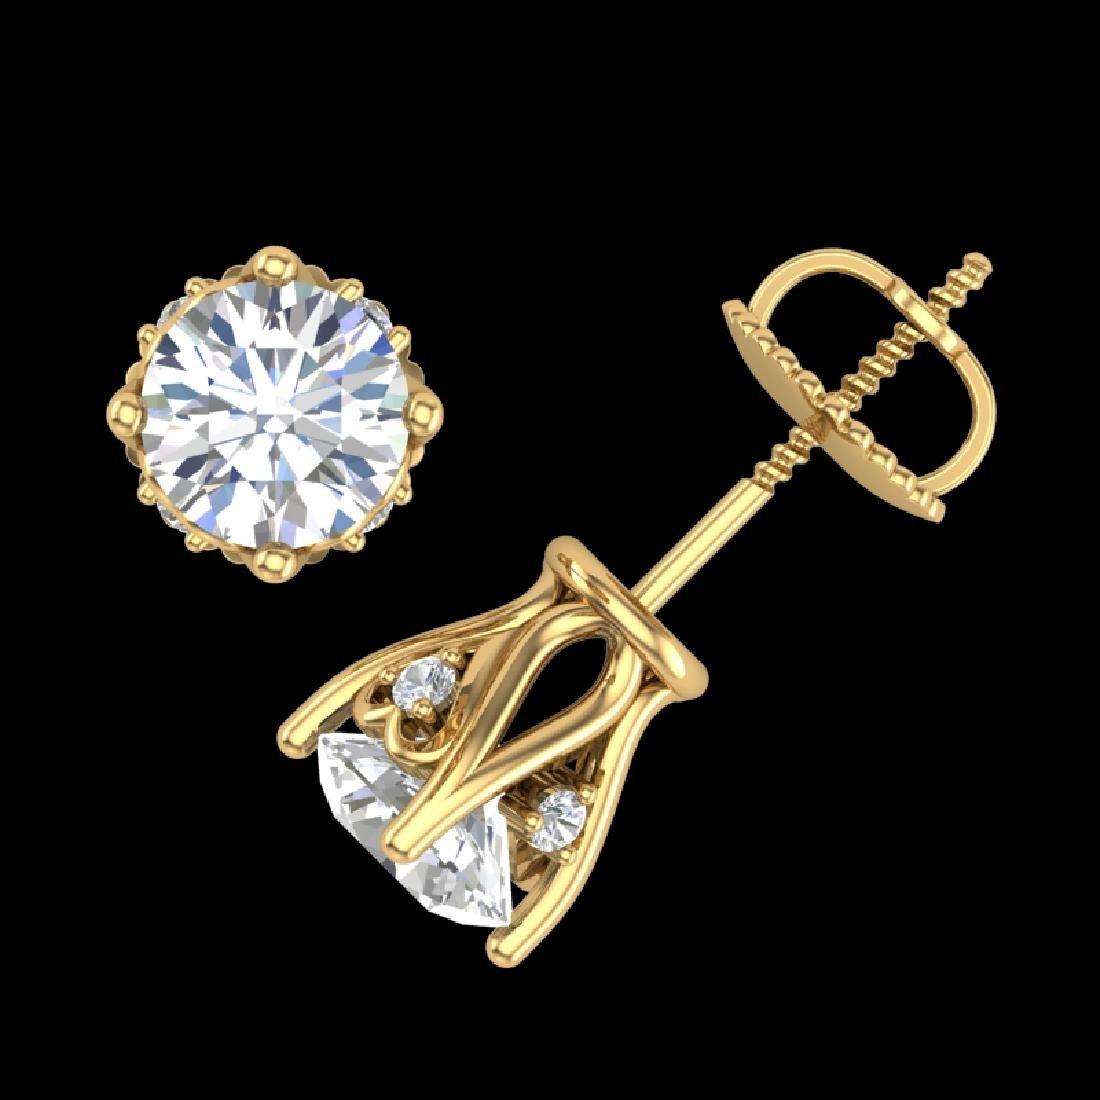 1.26 CTW VS/SI Diamond Solitaire Art Deco Stud Earrings - 3